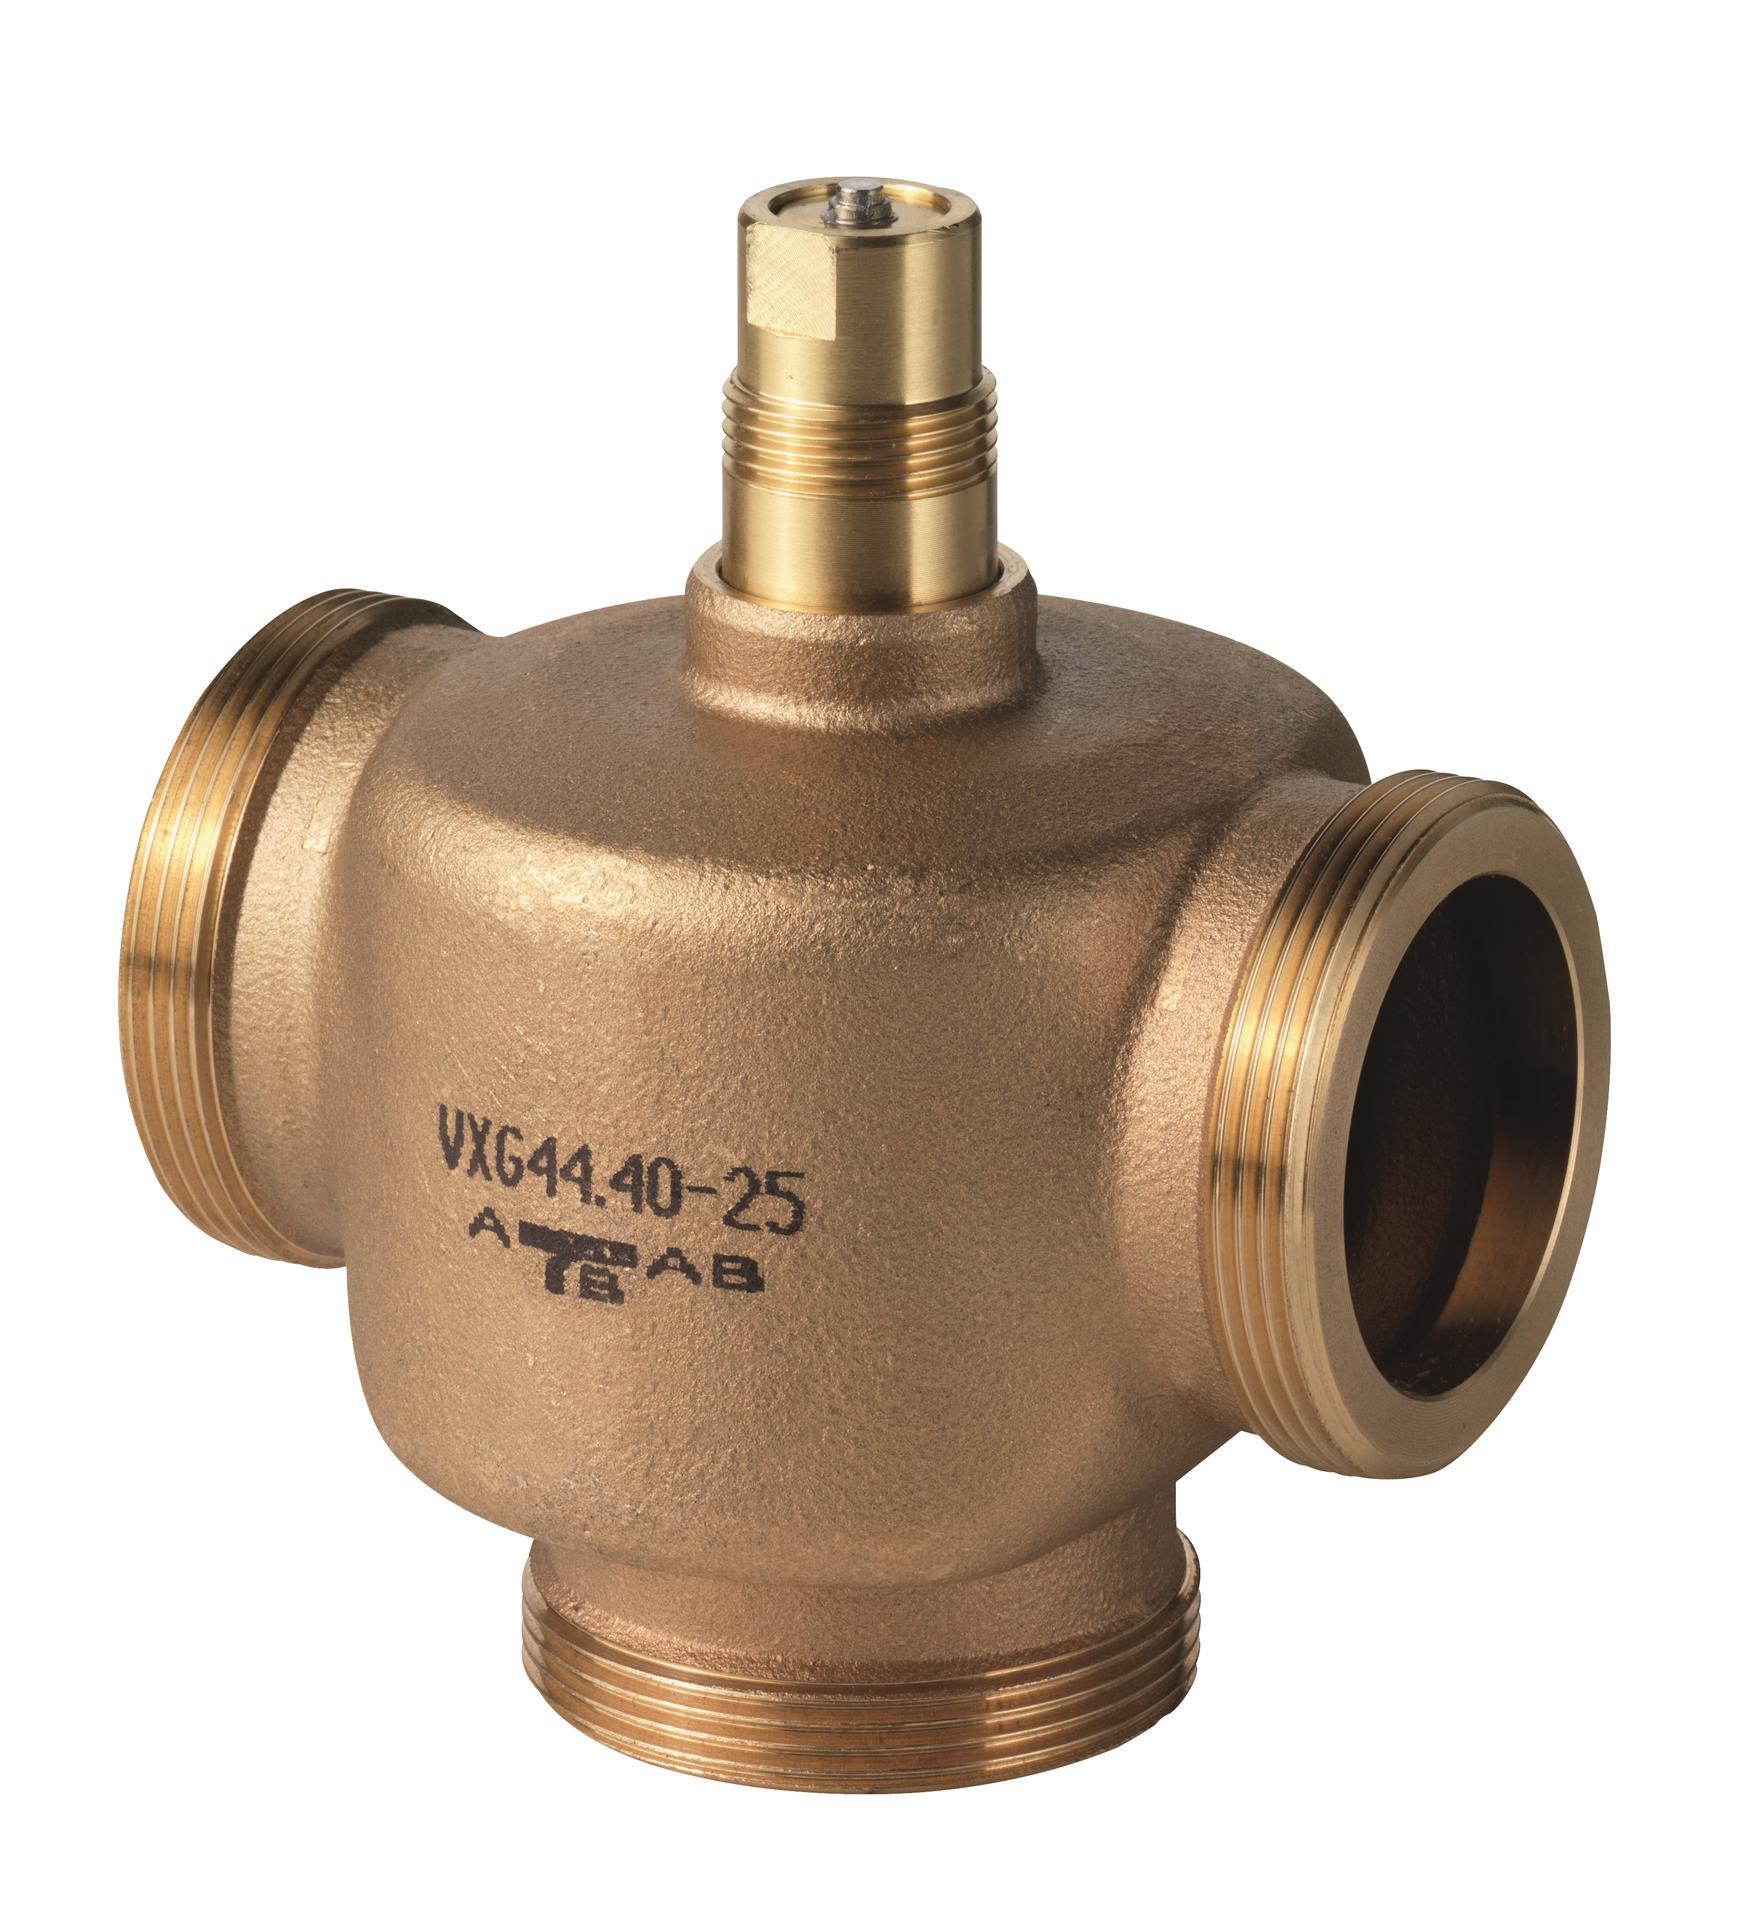 Регулирующий клапан Siemens VXG44 ду 15 VXG44.15-1.6